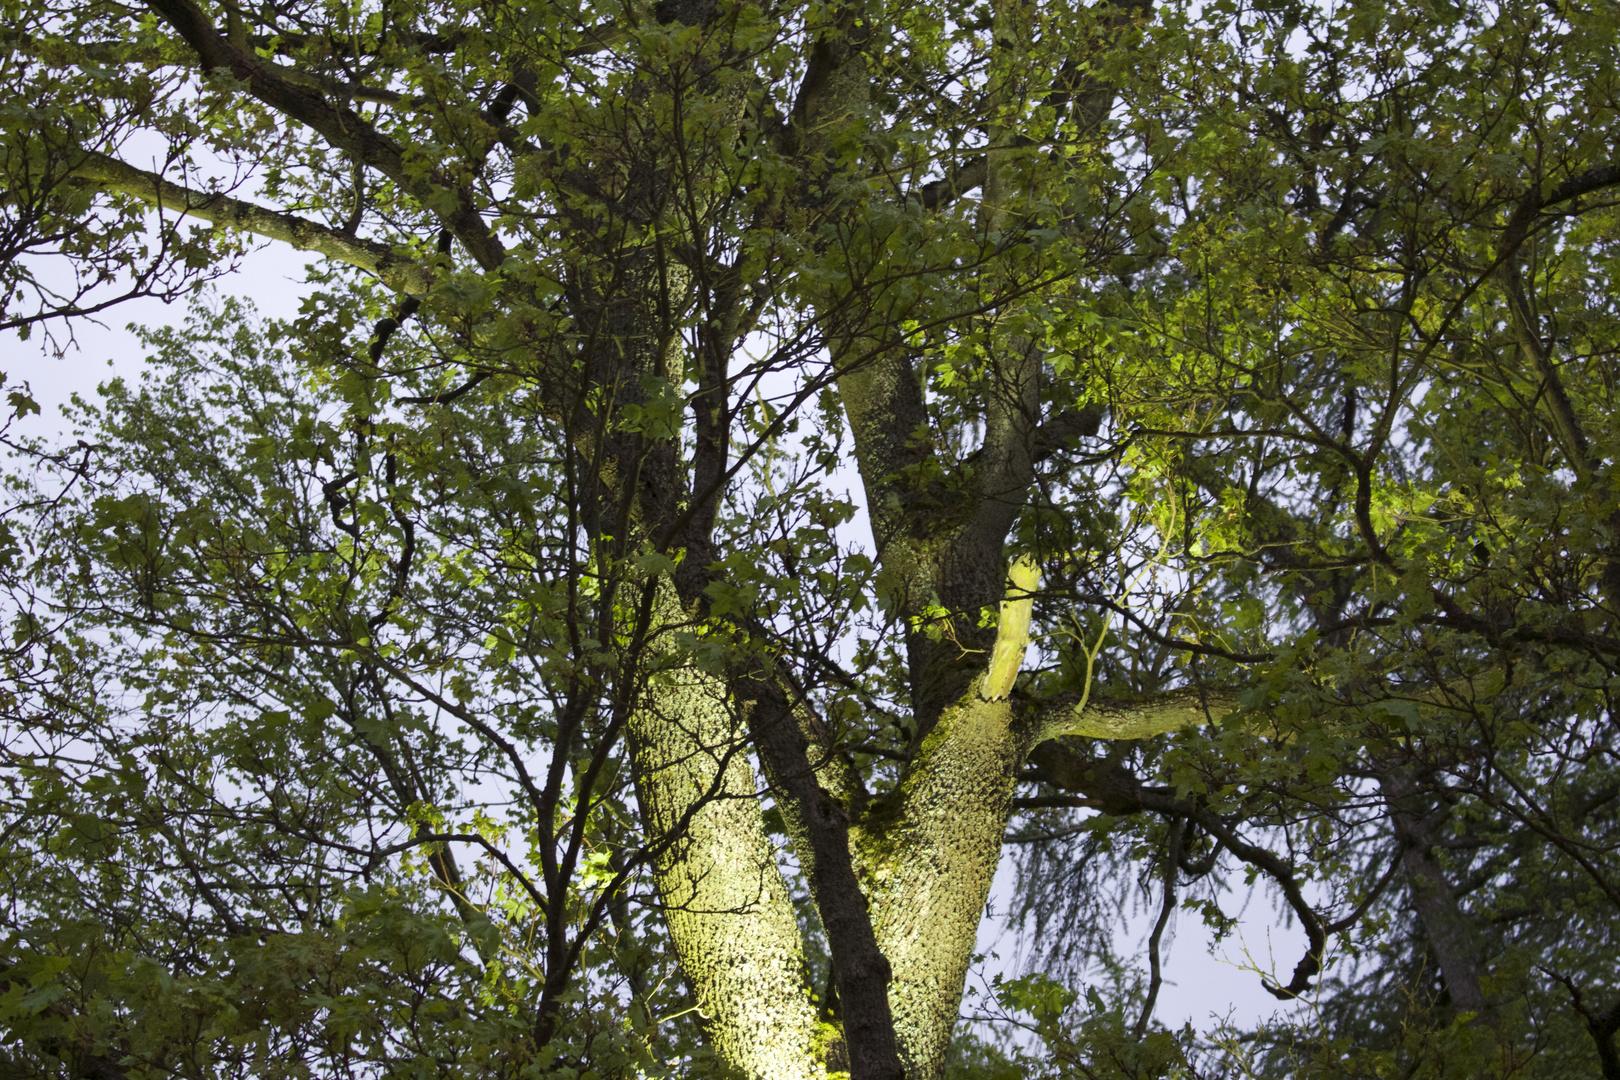 Baum angestrahlt